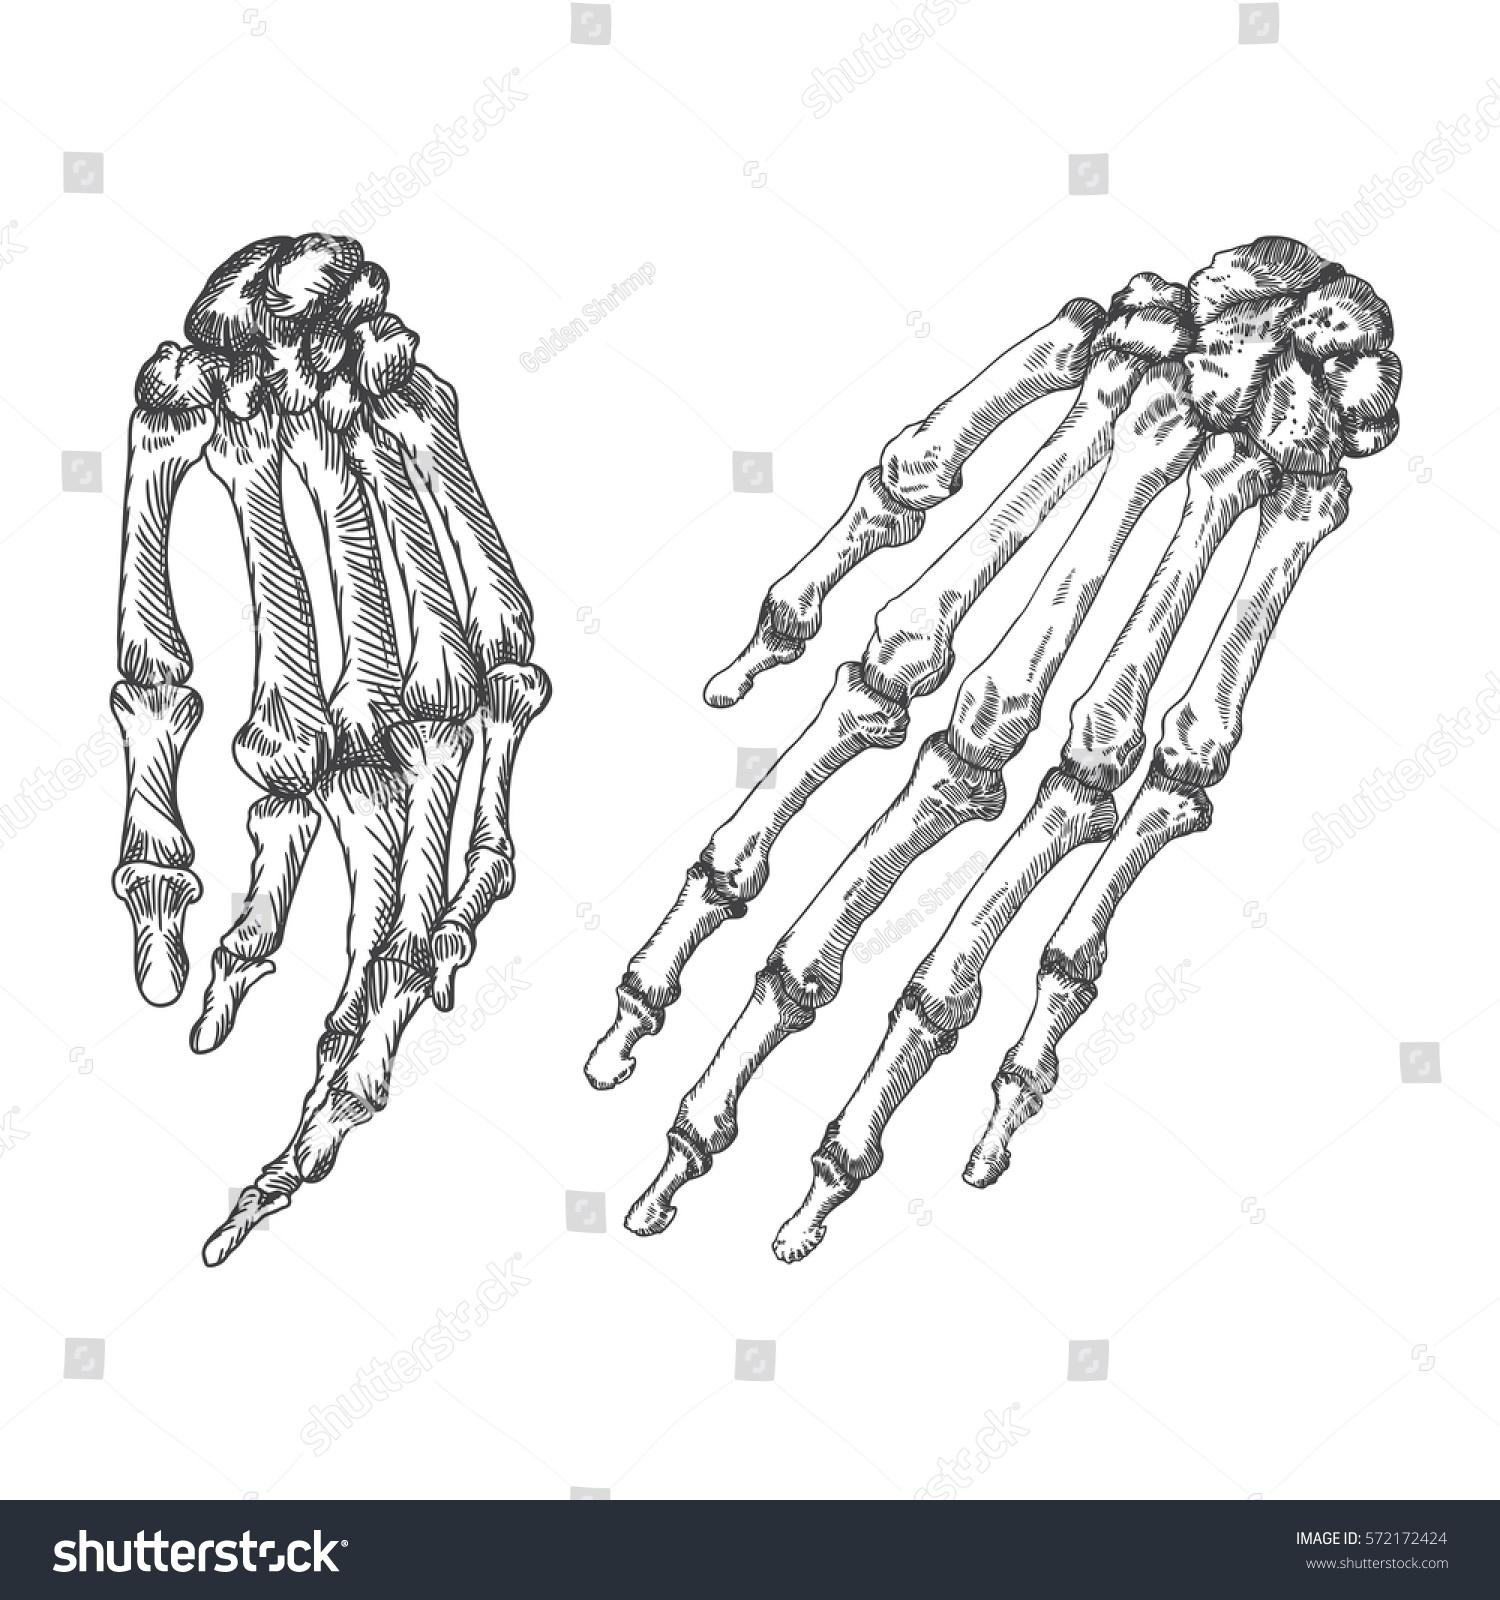 Human Bones Skeleton Hand Wrists Drawing Stockillustration 572172424